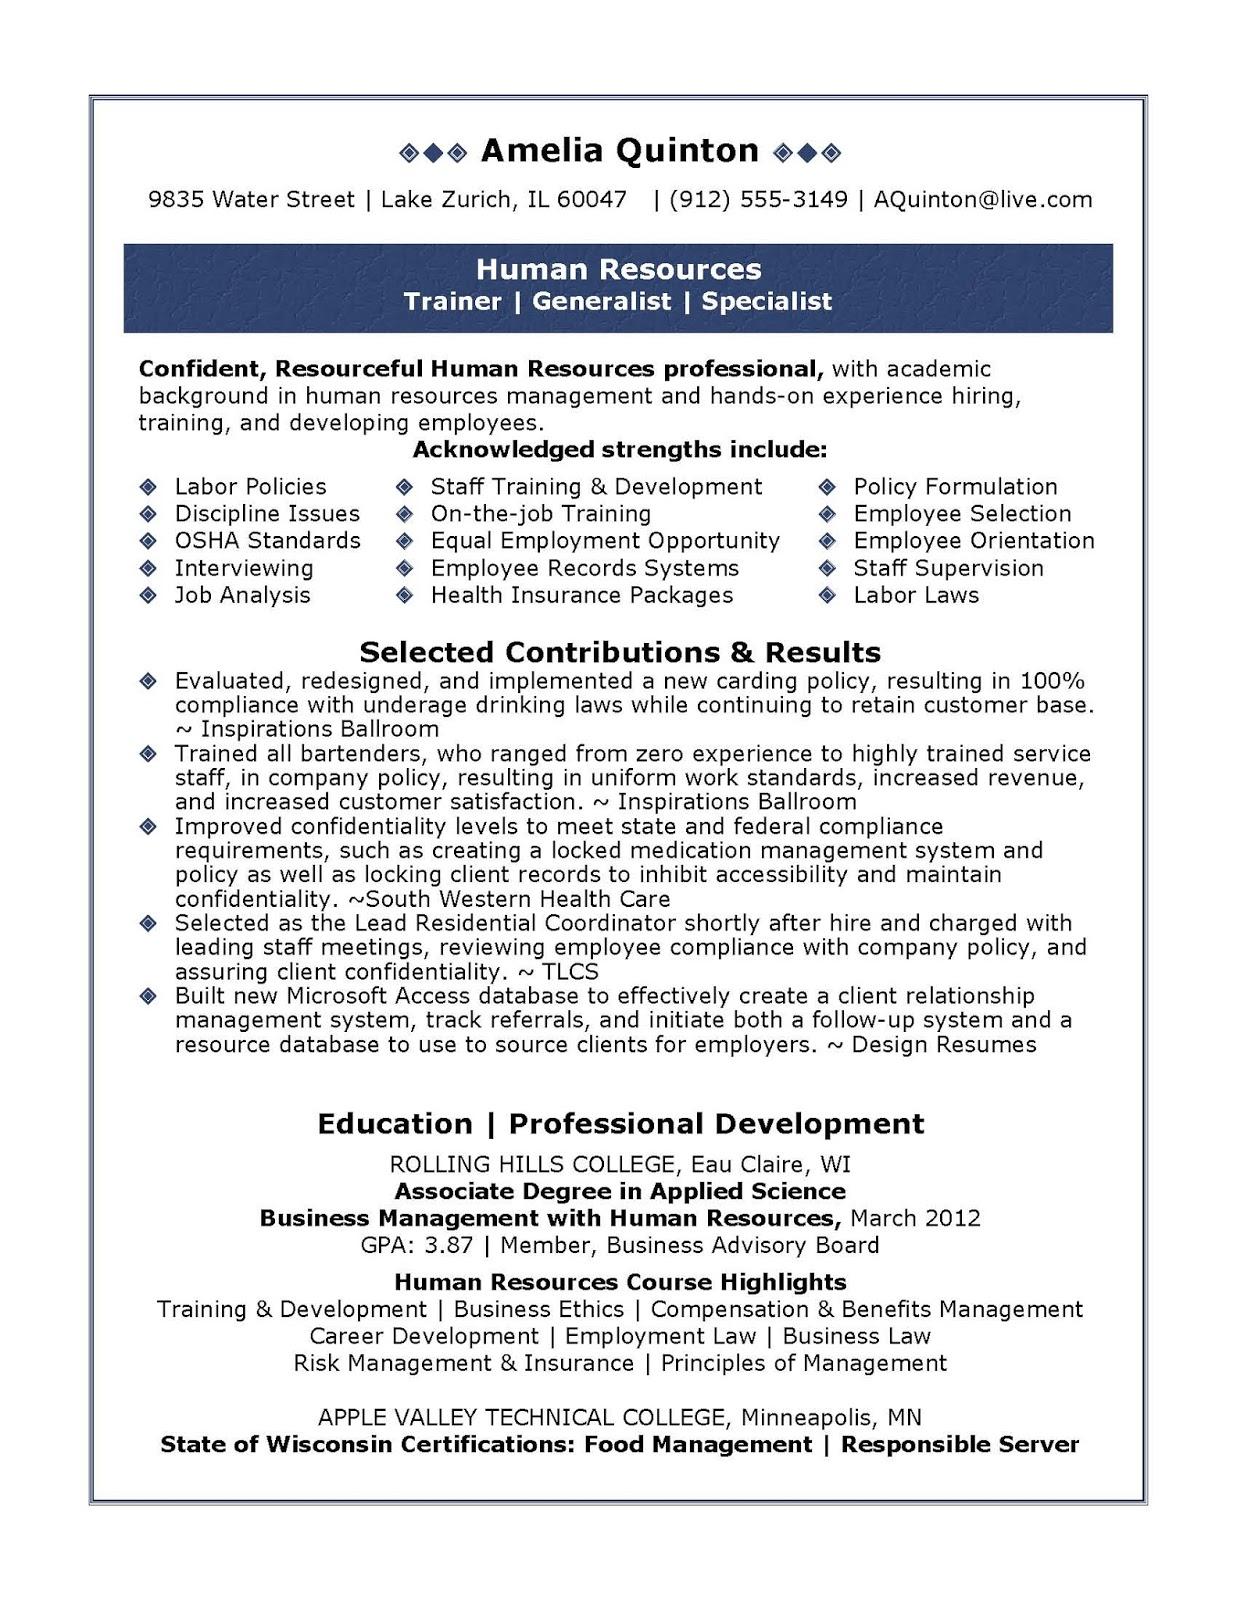 example of resume to apply job resume sample